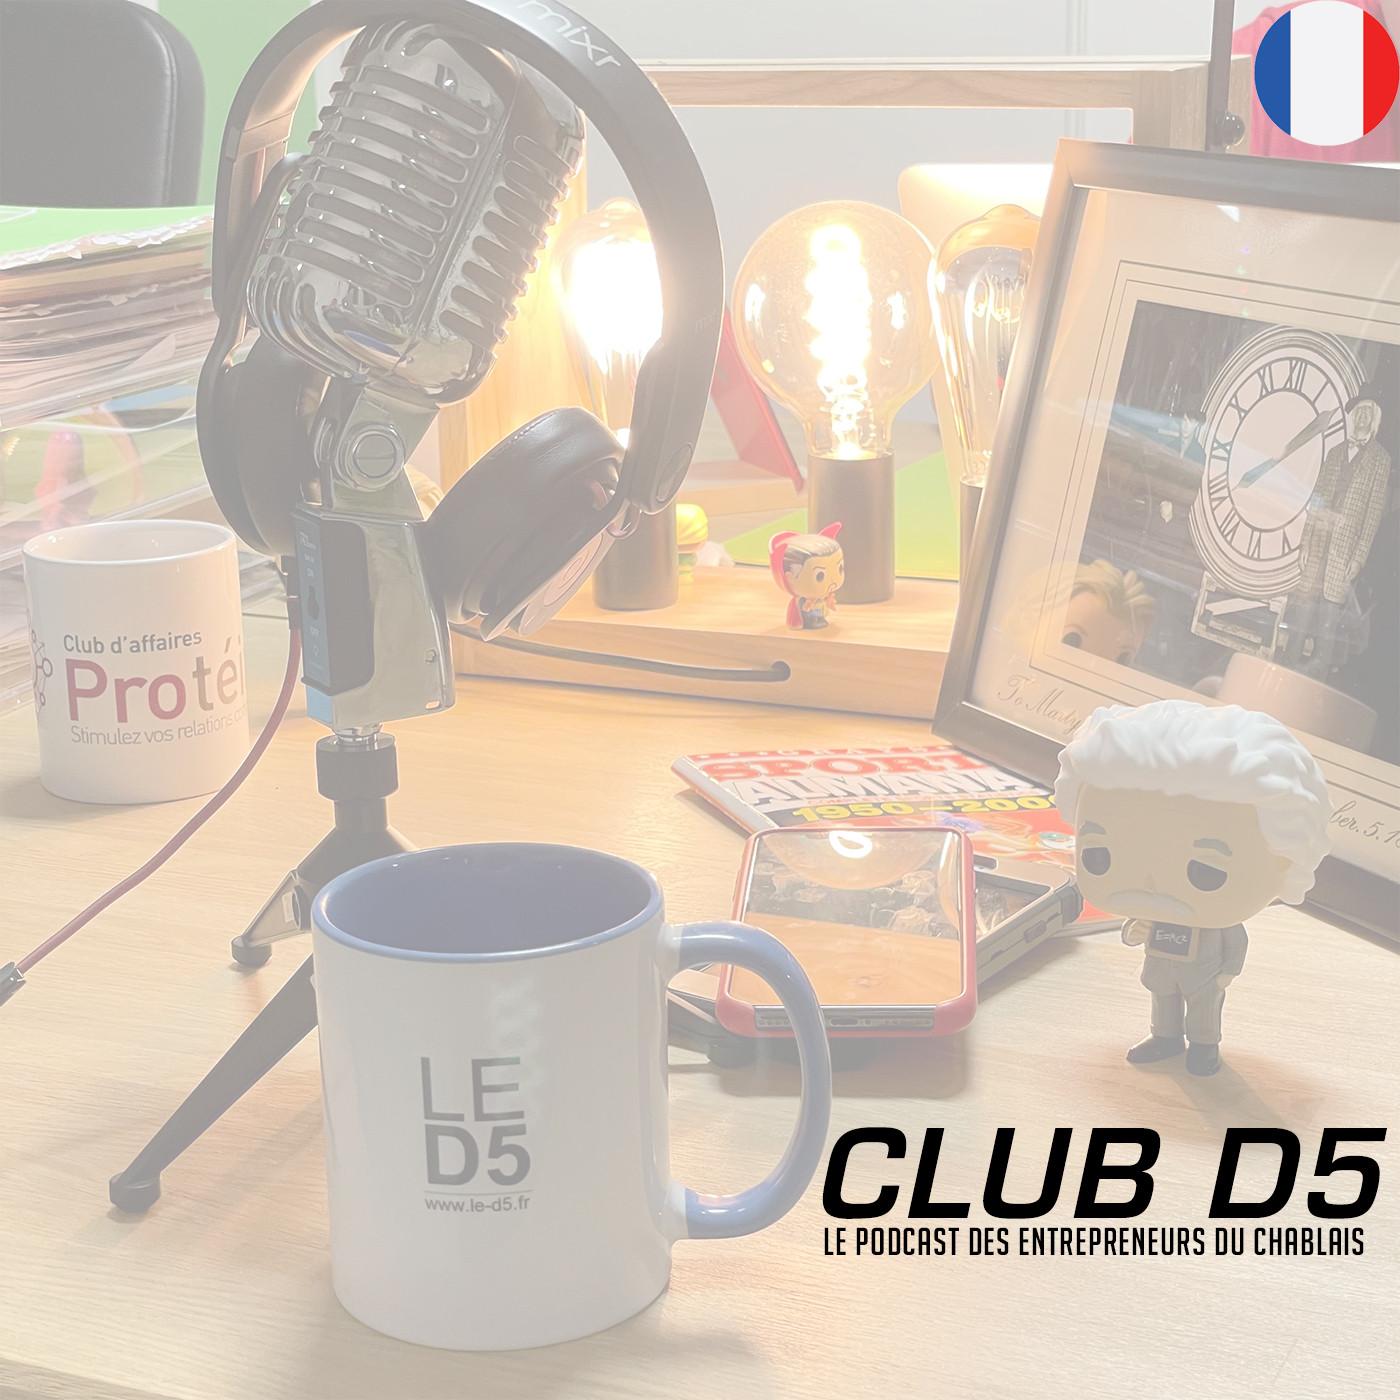 Club D5